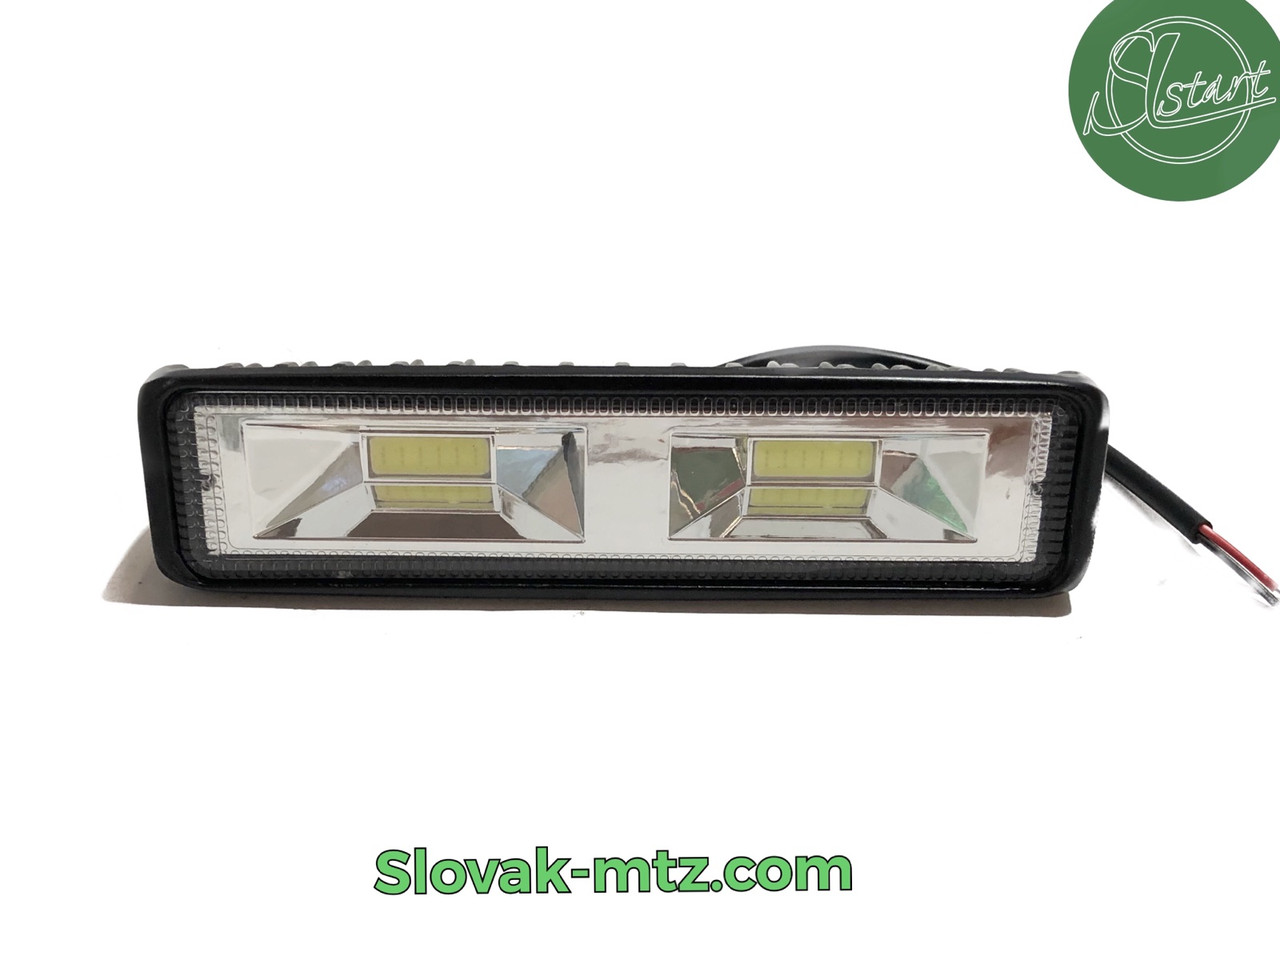 Светодиодная LED фара 20Вт  (светодиоды 2w x10шт) Широкий луч